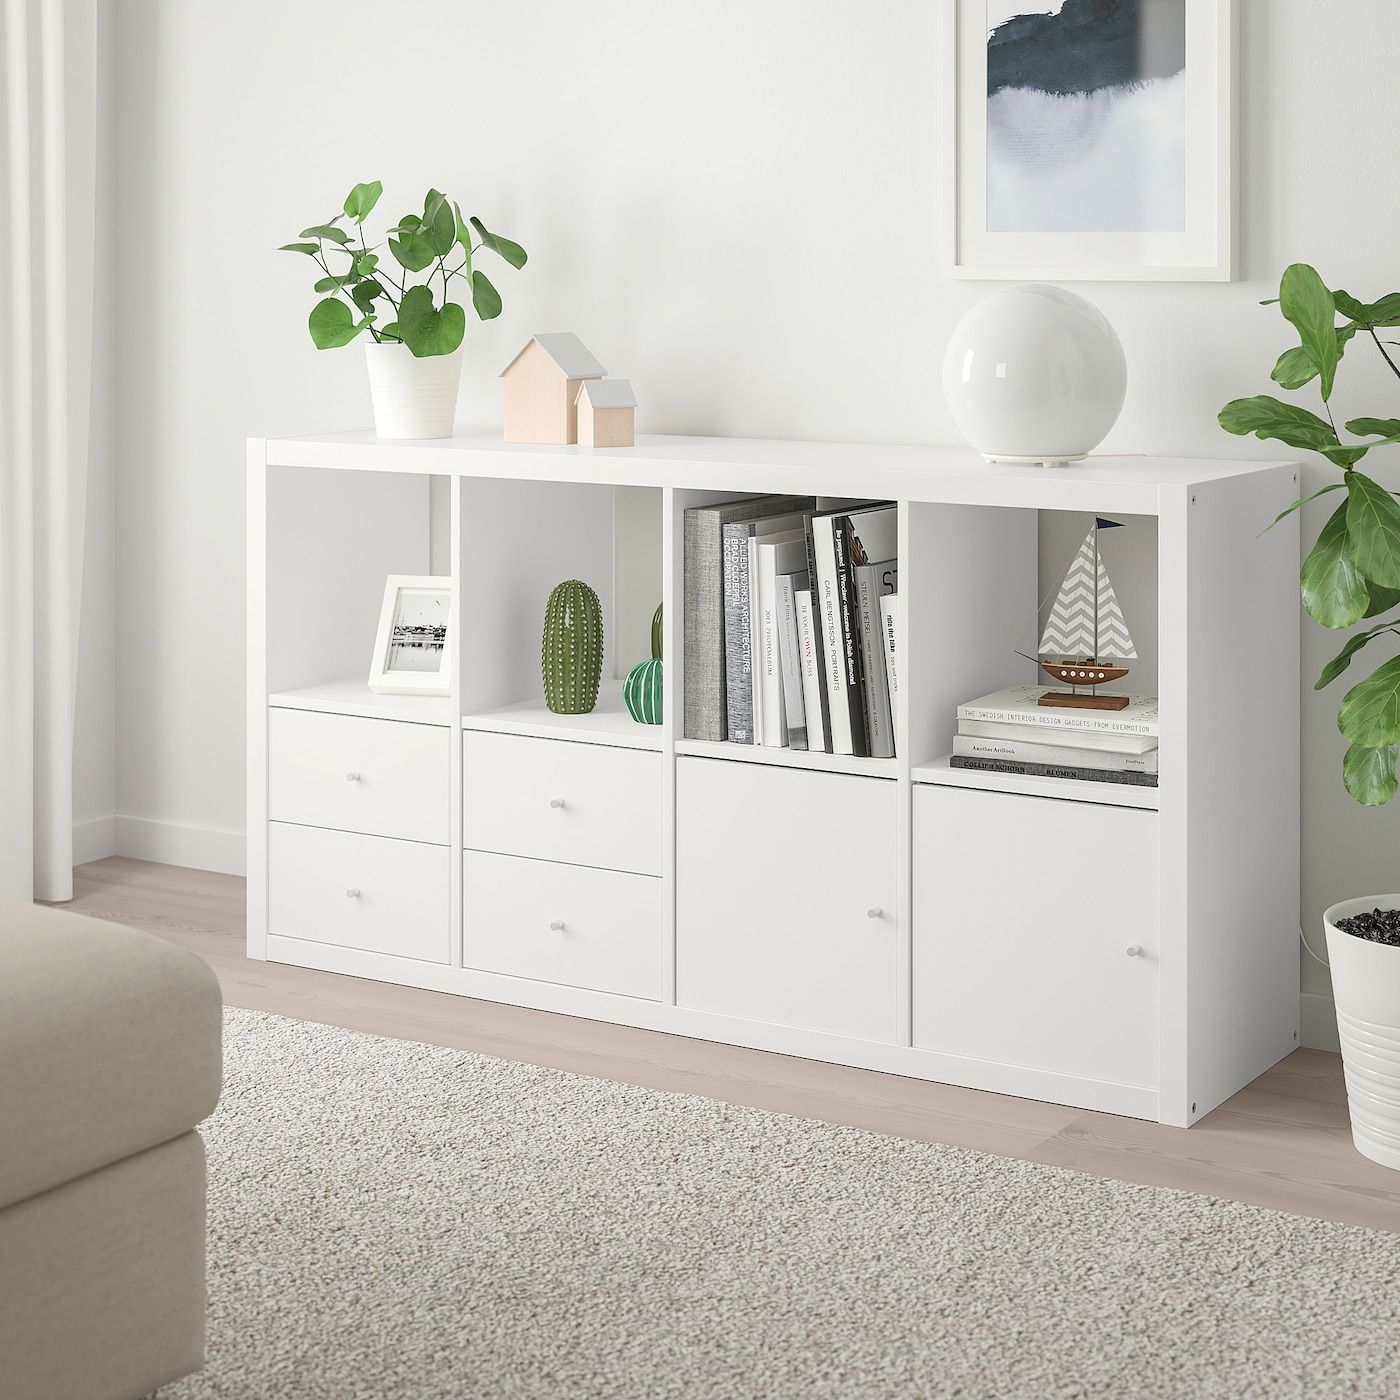 KALLAX Shelf unit with 4 inserts, white, 303/8×577/8″ – IKEA